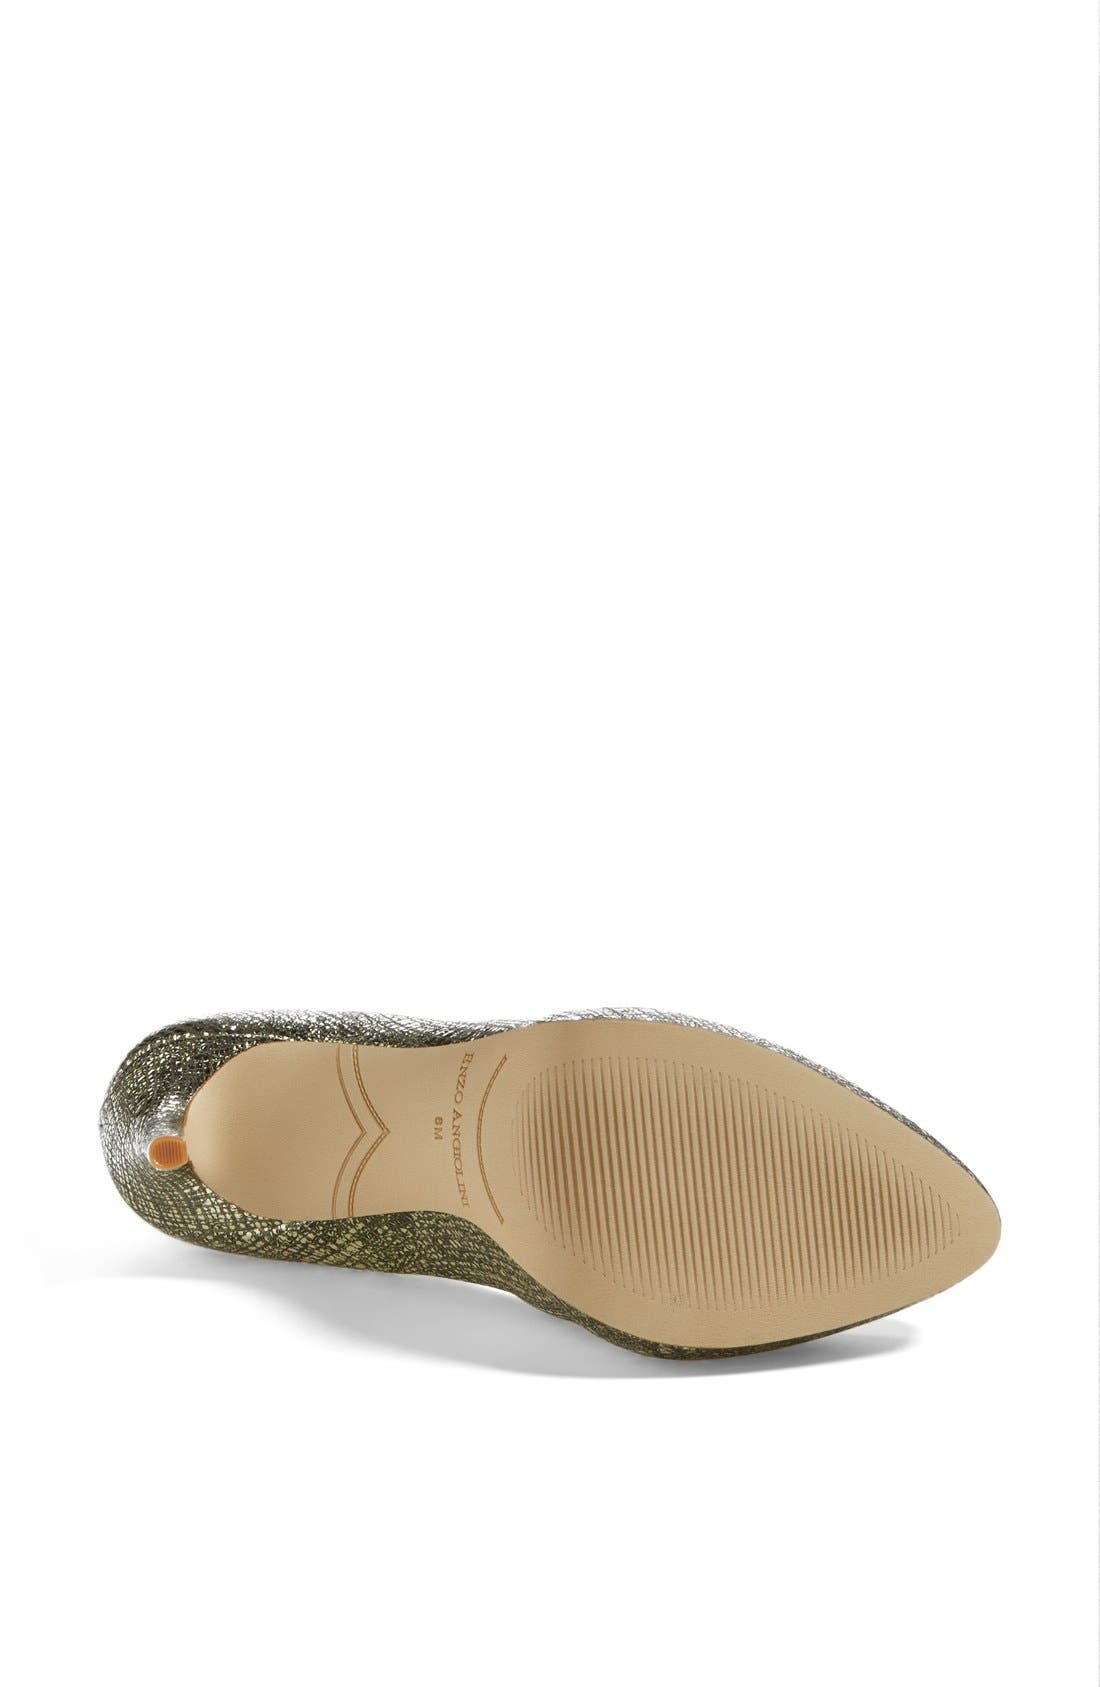 ,                             'Samendra' Cheetah Spot Calf Hair Platform Pump,                             Alternate thumbnail 10, color,                             710